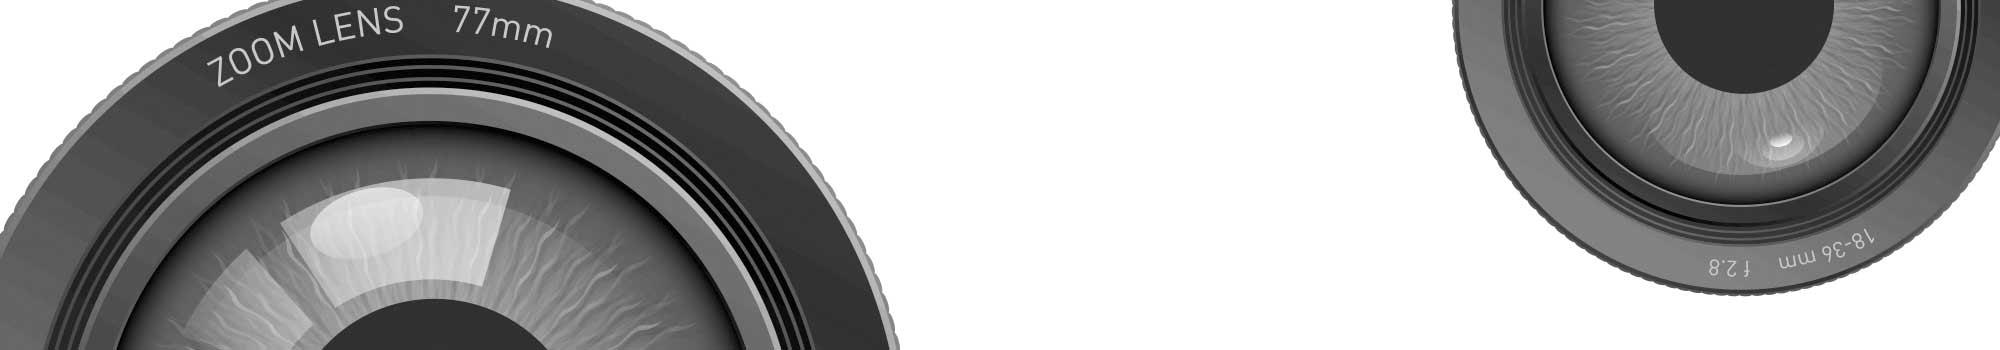 imagen cabecera imagen en la retina